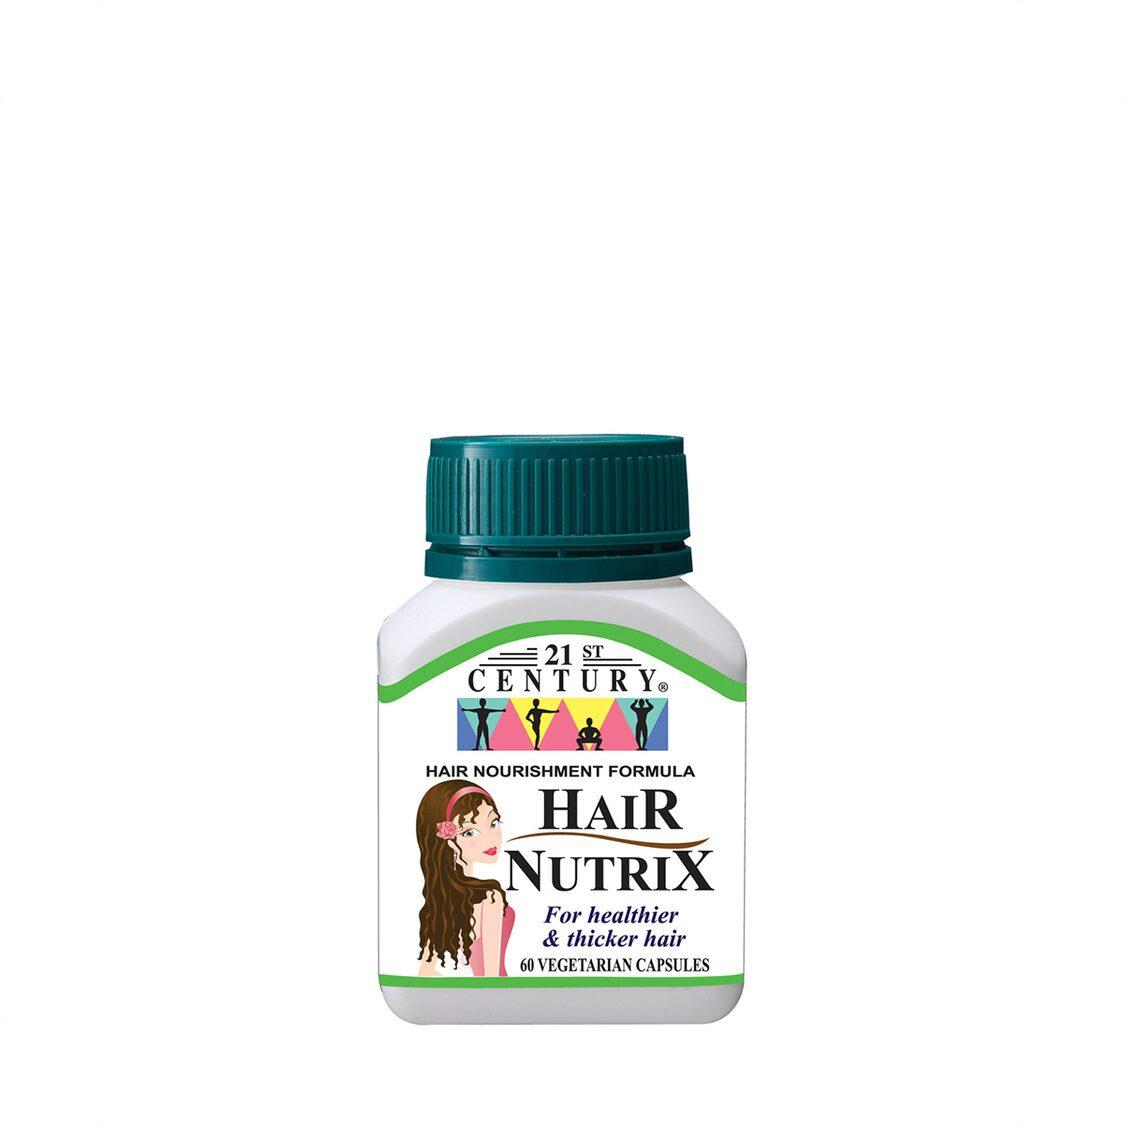 Hair Nutrix Vege Caps 60s